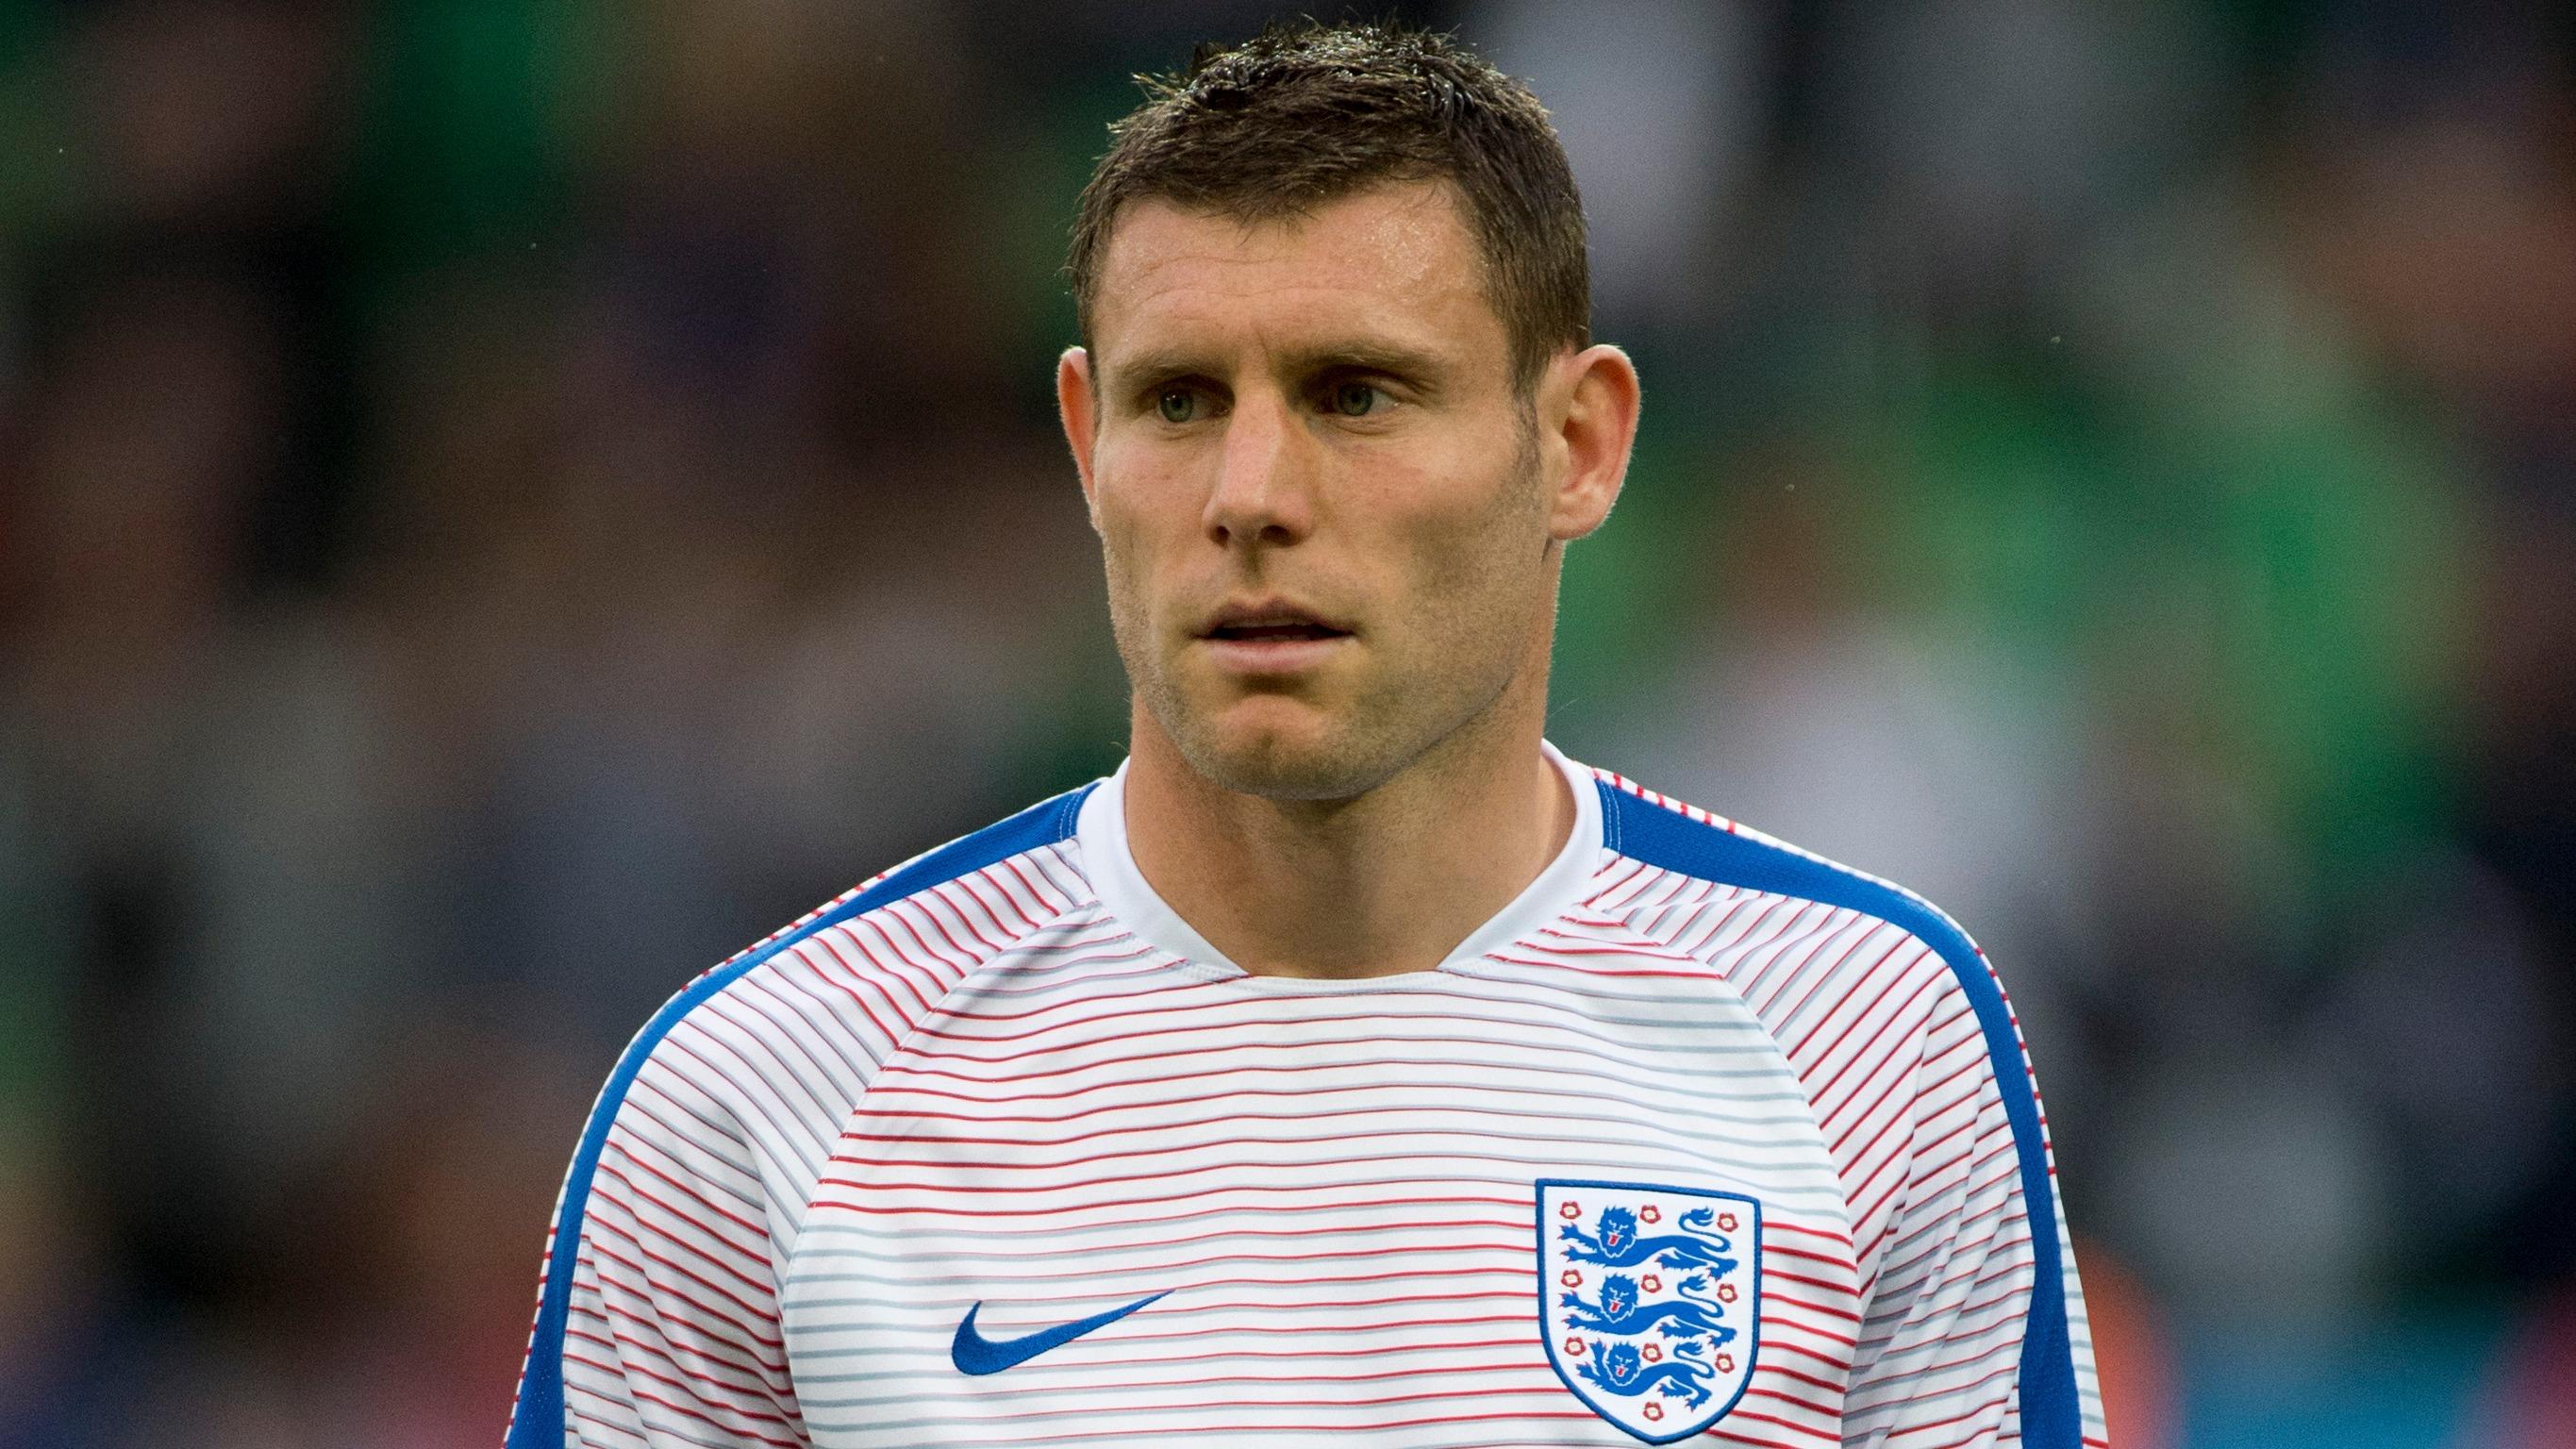 liverpool midfielder james milner considering england future